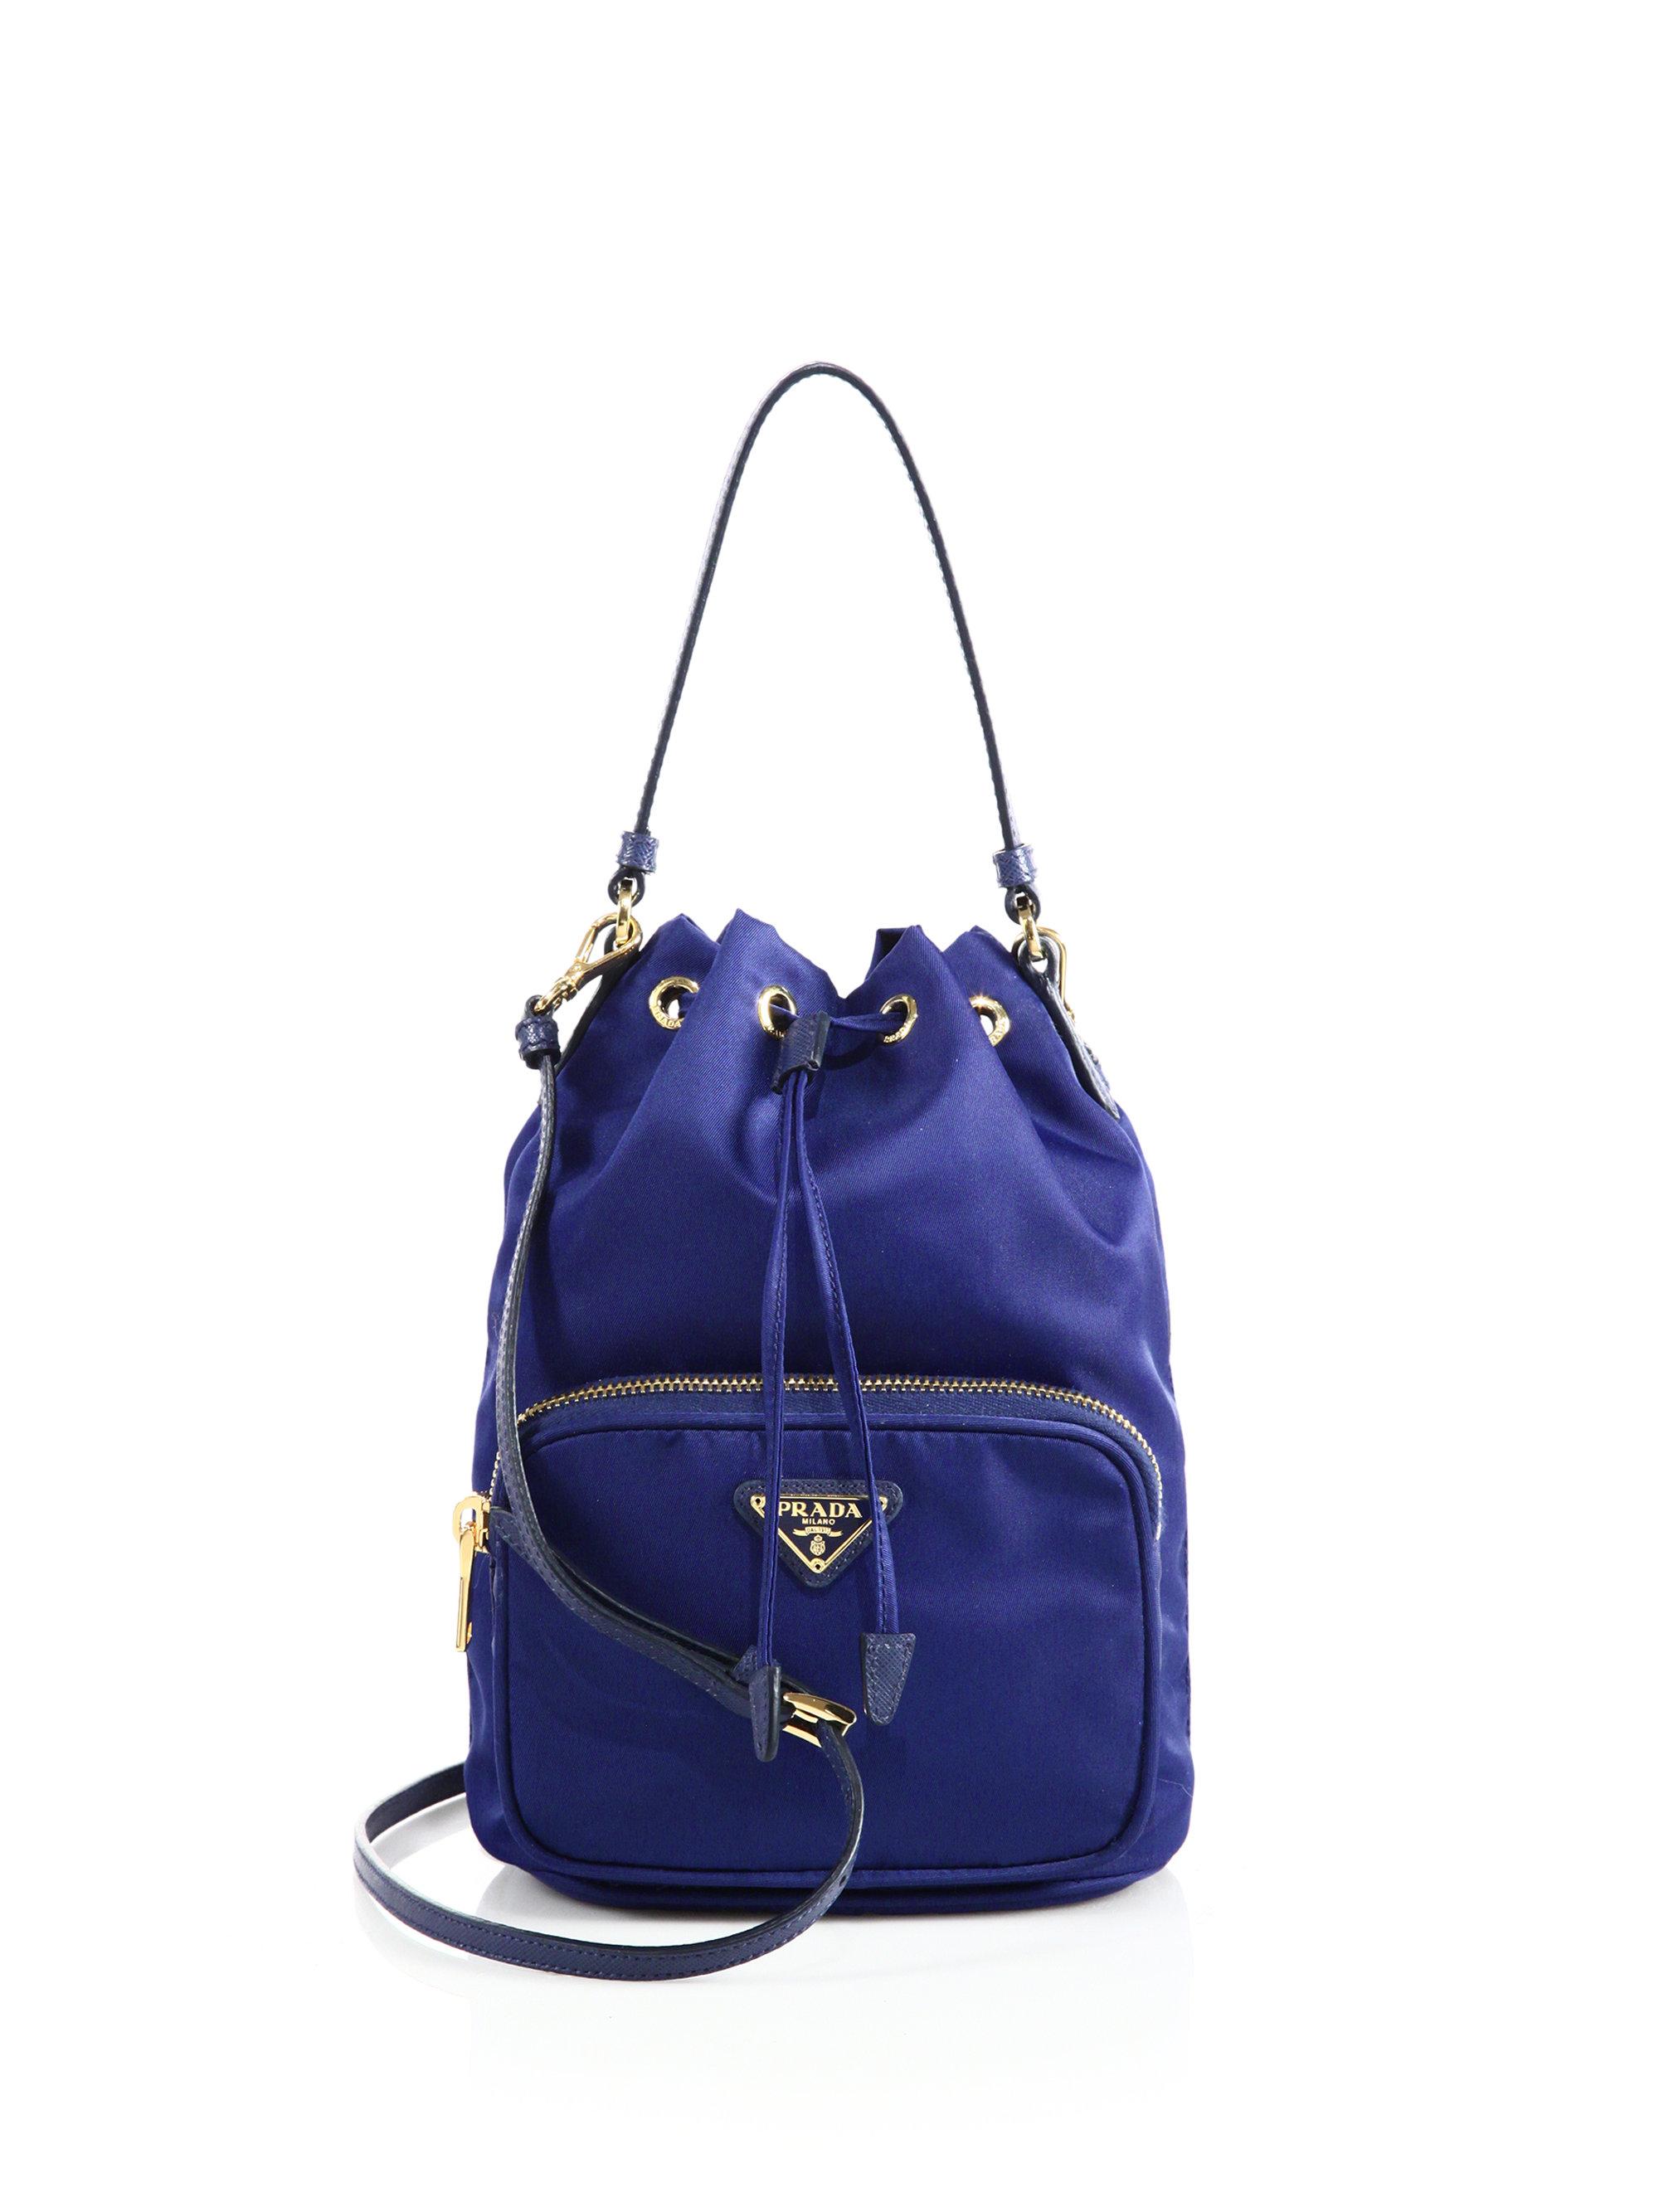 8ec47f65024116 Prada Mini Nylon and Leather Bucket Bag in Blue - Lyst